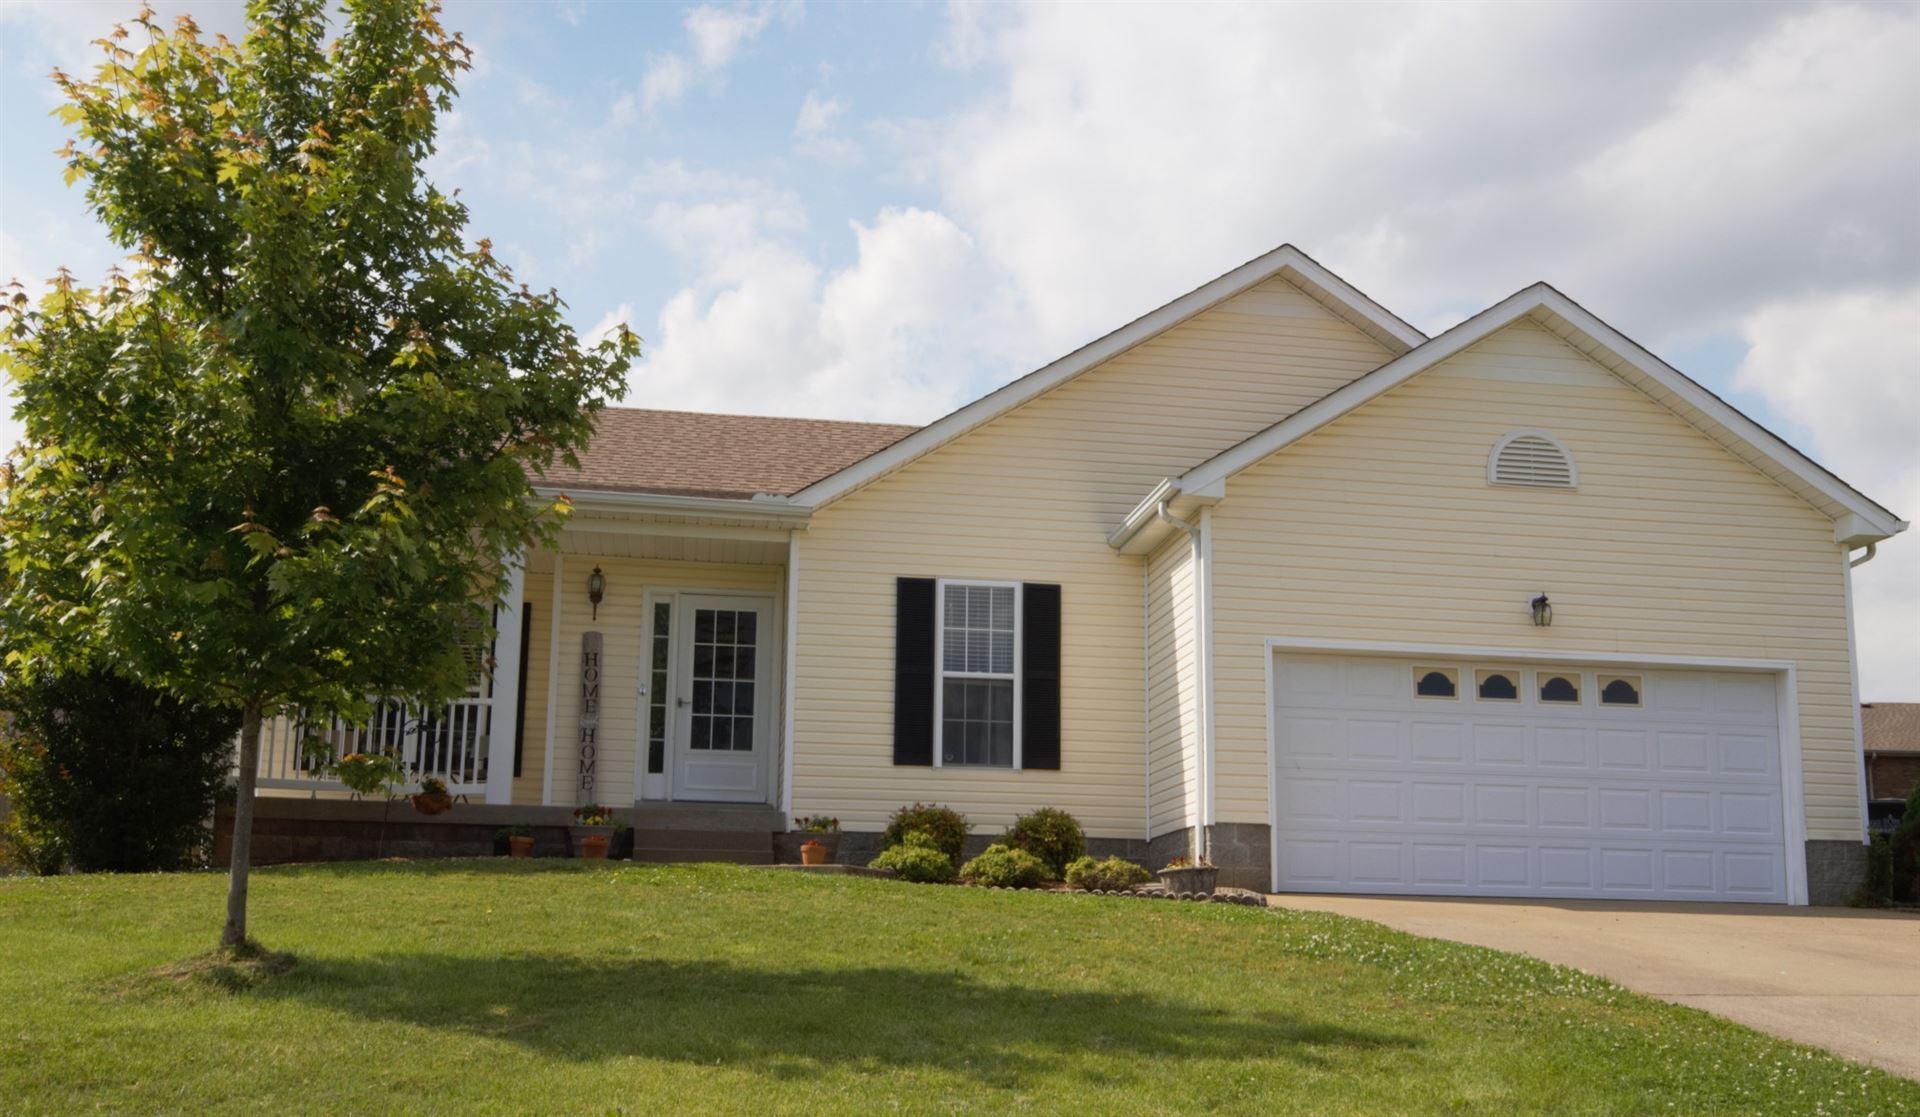 1939 Whirlaway Cir, Clarksville, TN 37042 - MLS#: 2251246